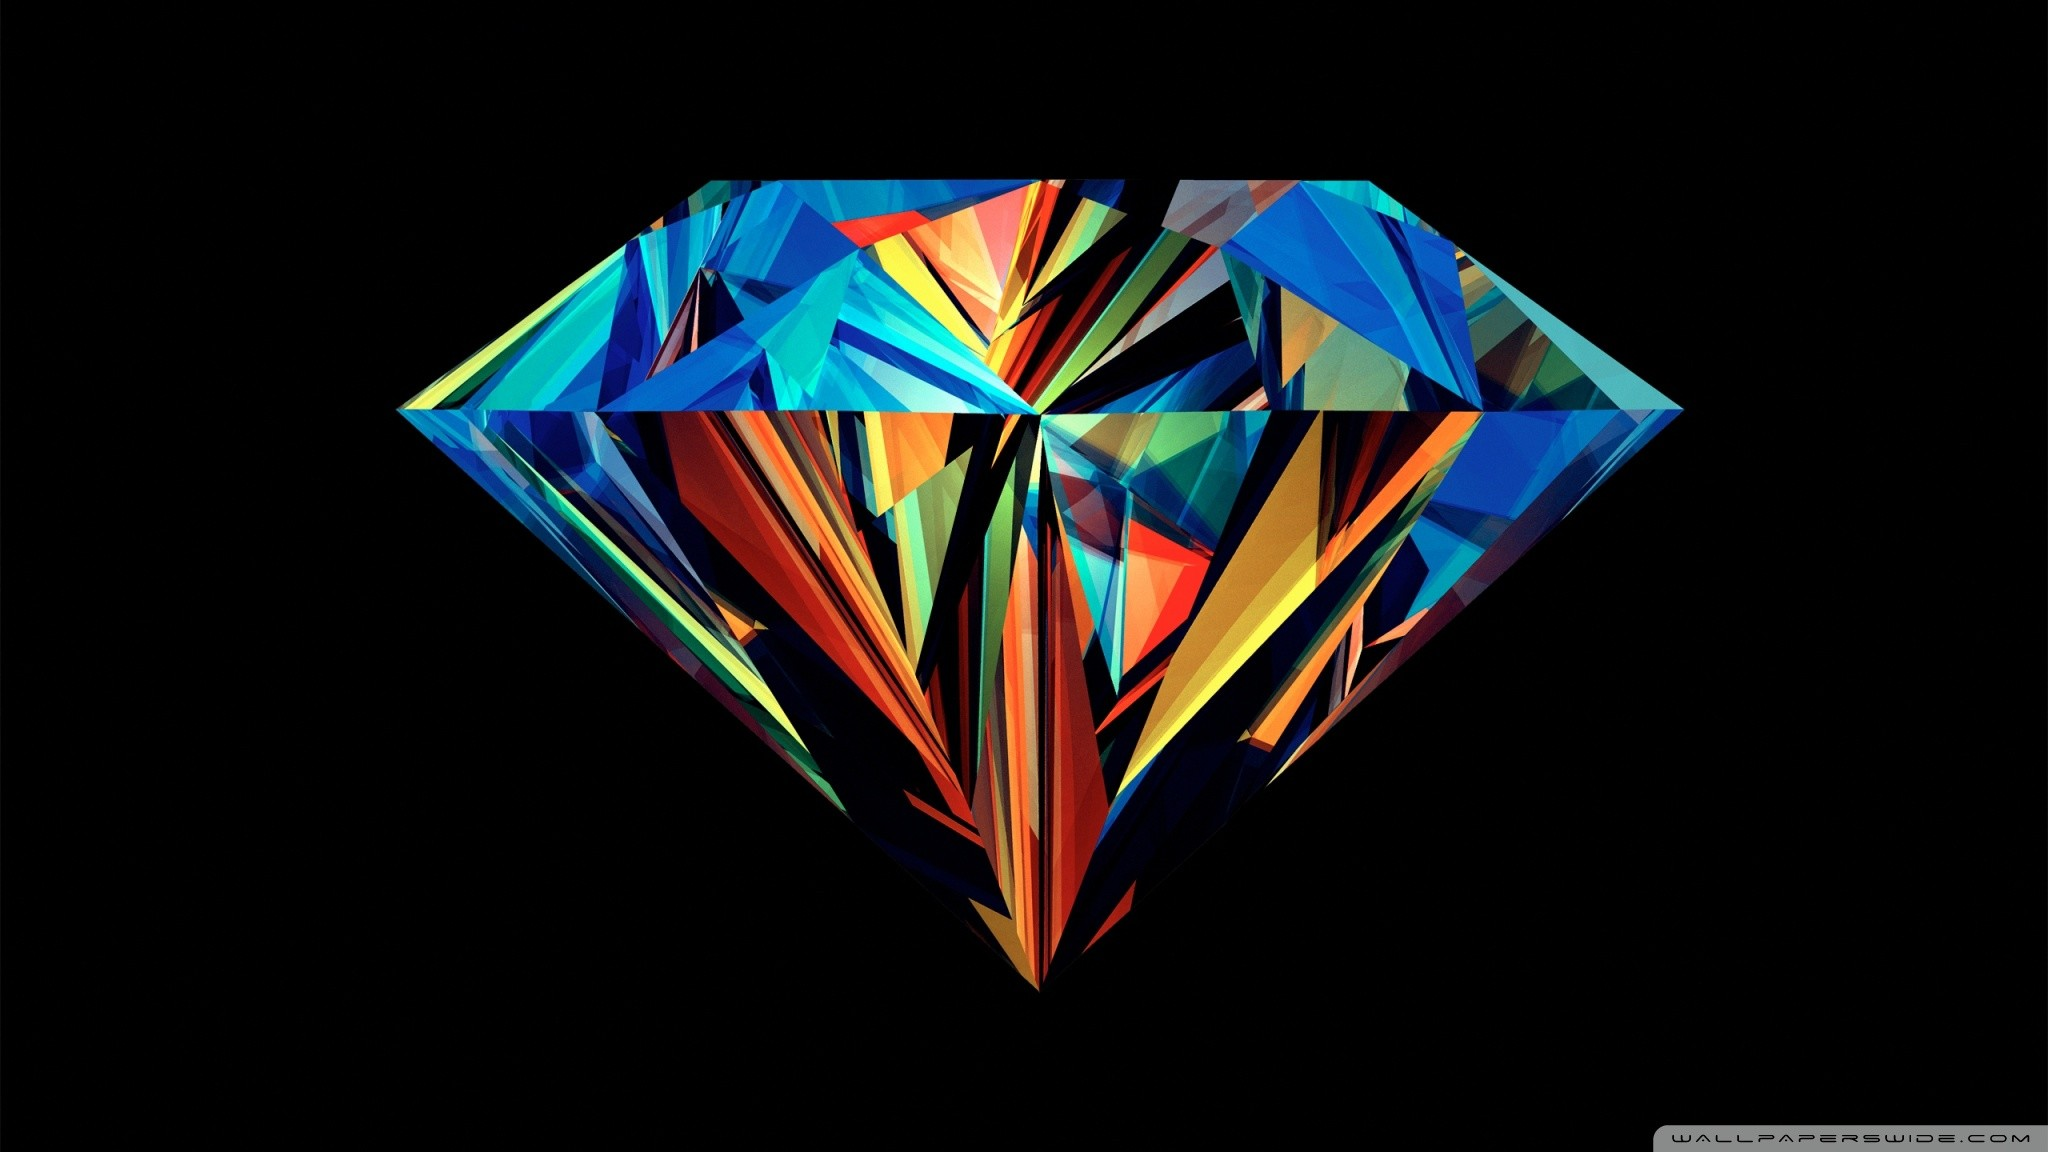 Abstract Colorful Diamond 1280 x 1024 Wallpaper